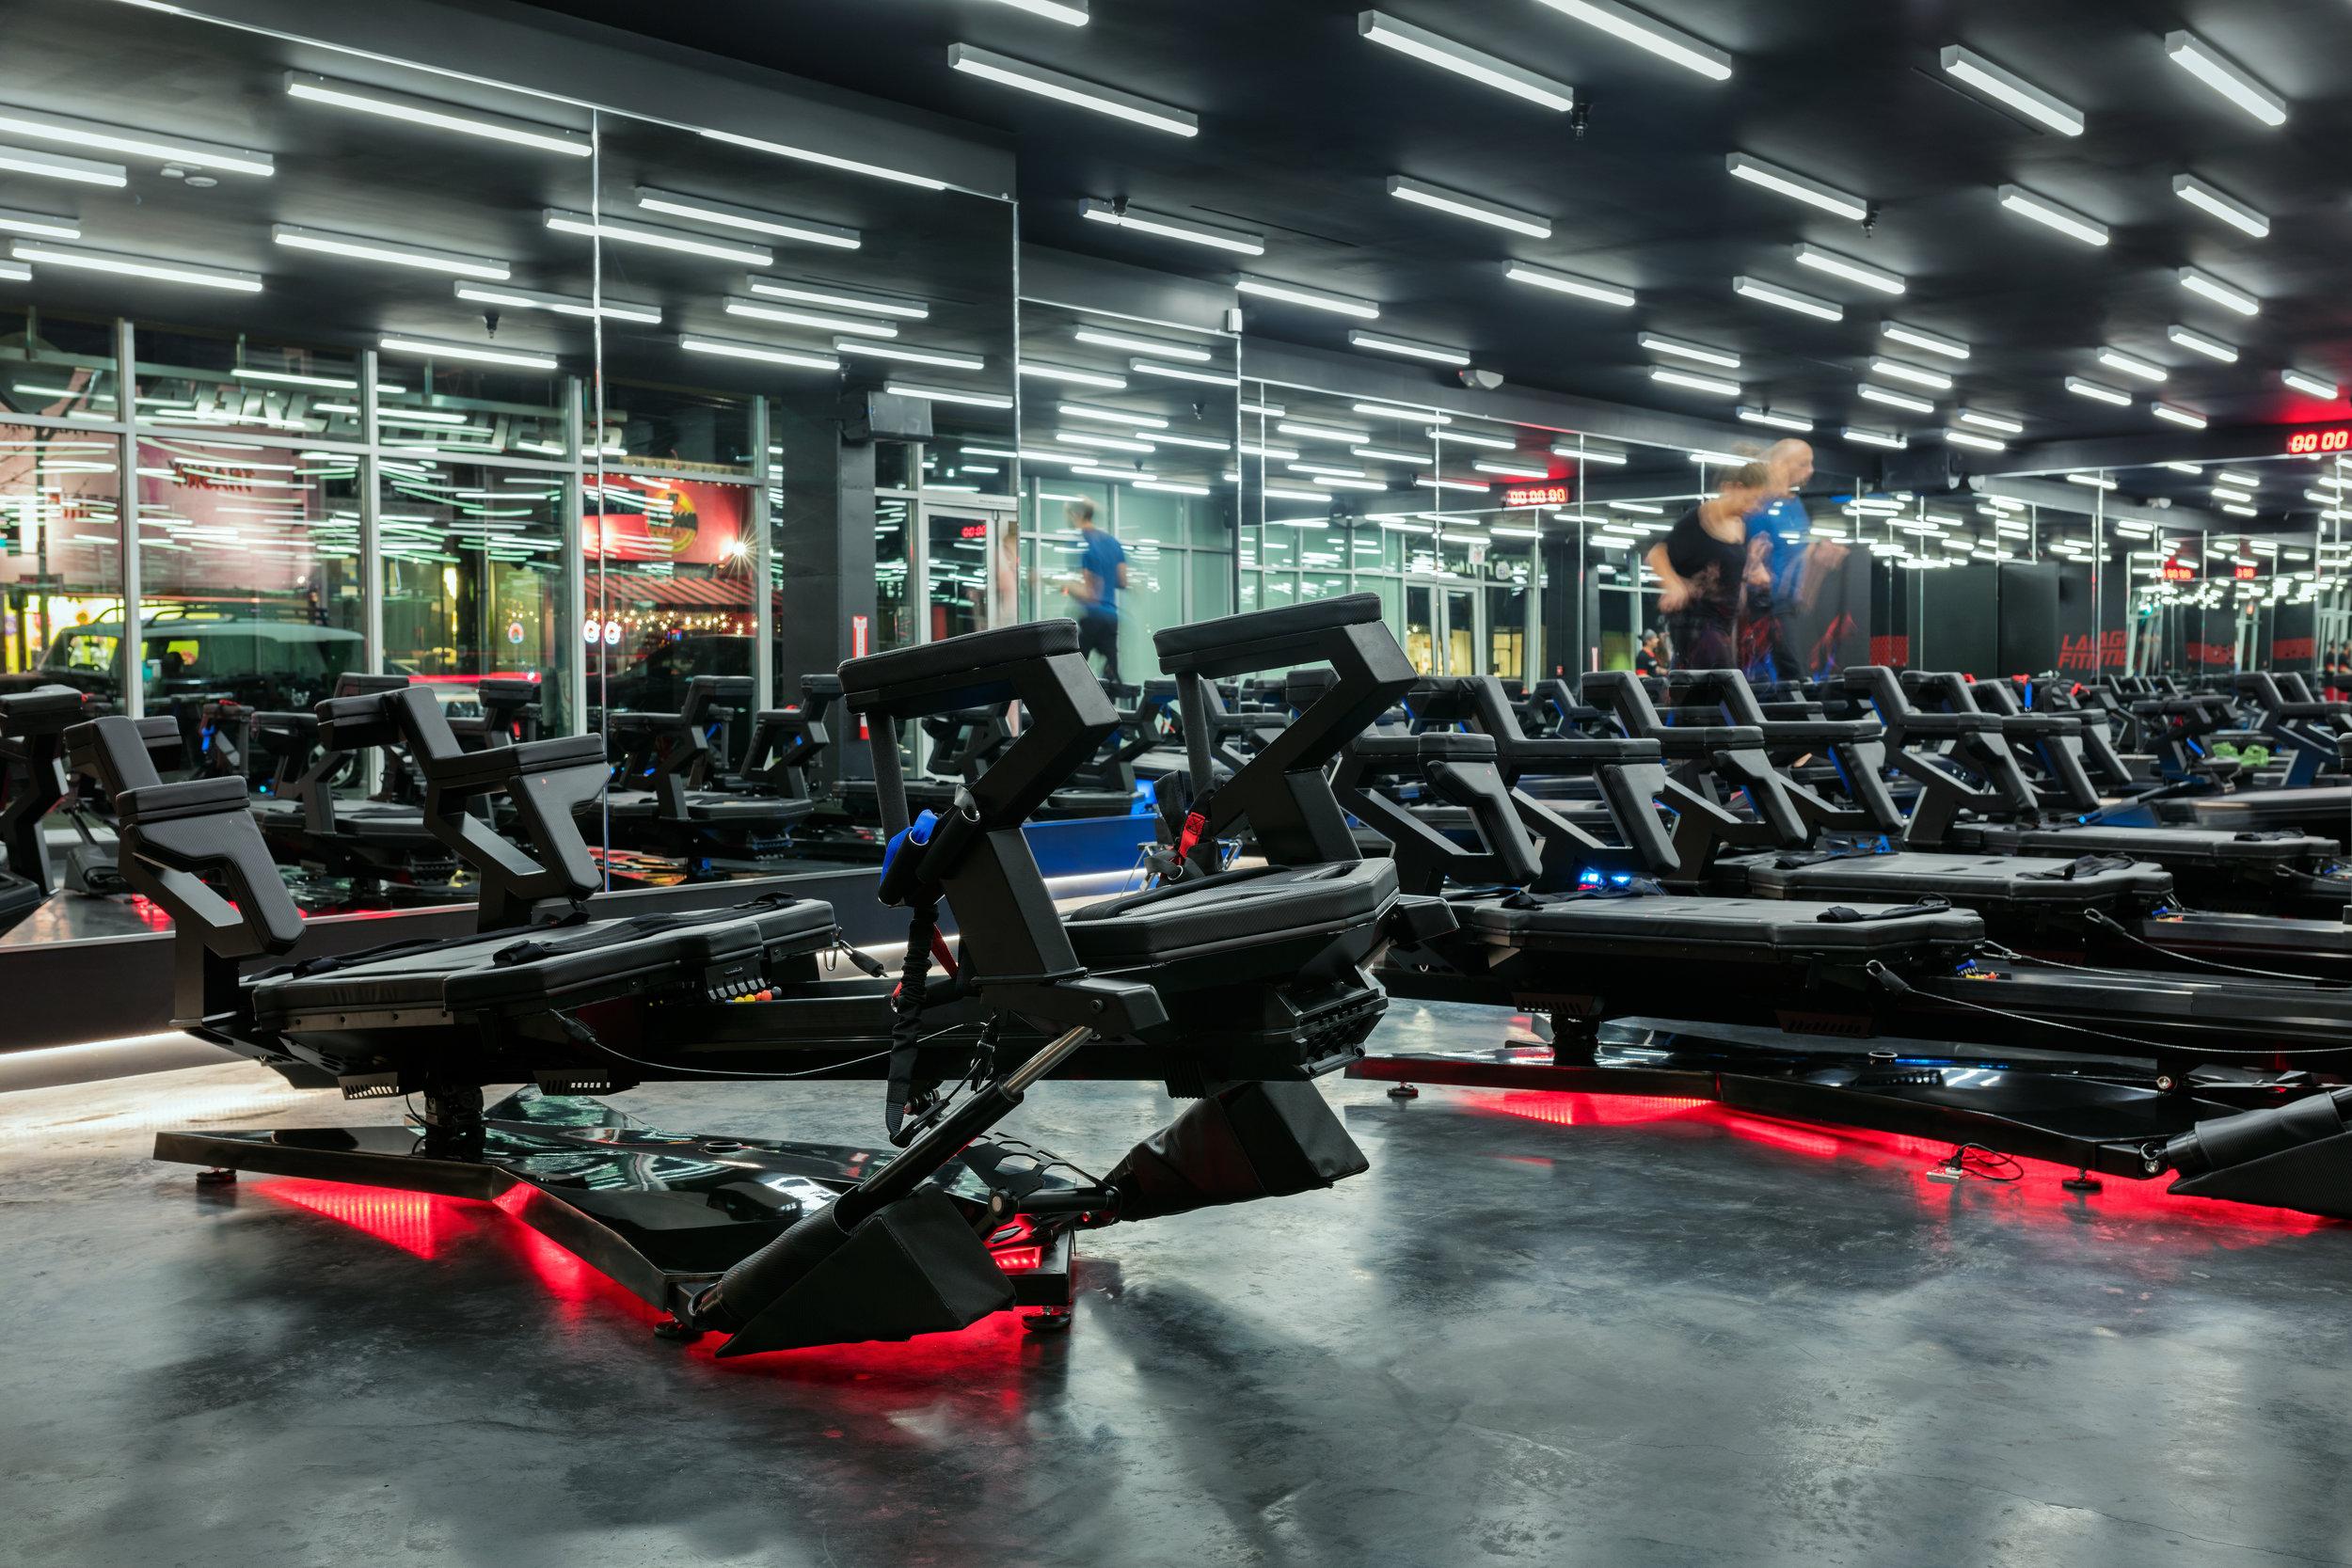 Supraformer at Lagree Fitness Studio - The Gilded Bellini